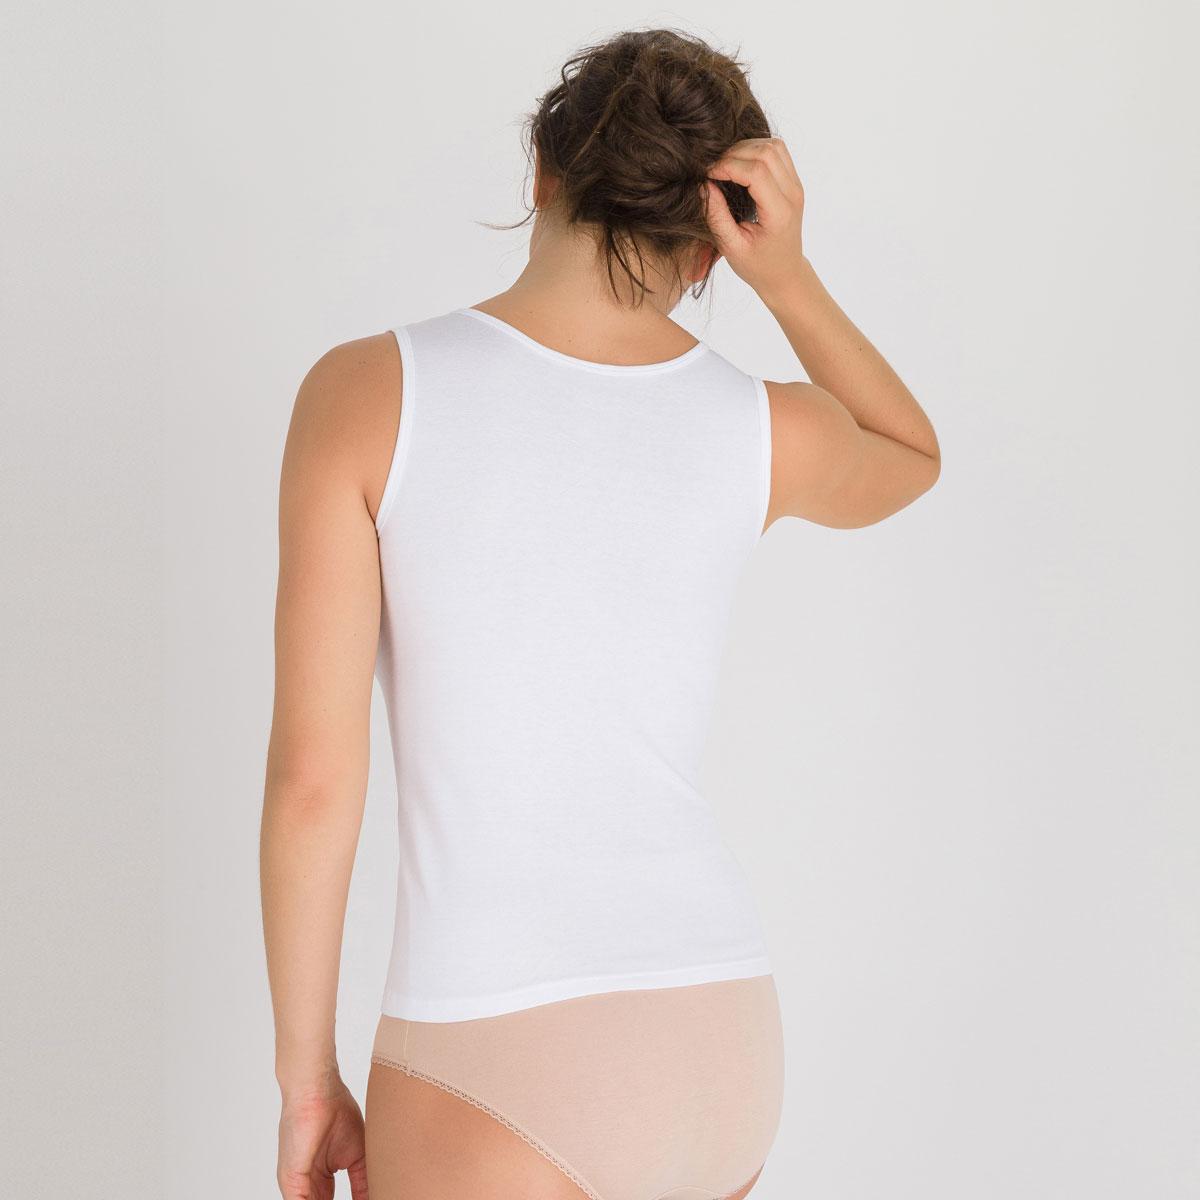 Débardeur blanc - Cotton Liberty-PLAYTEX